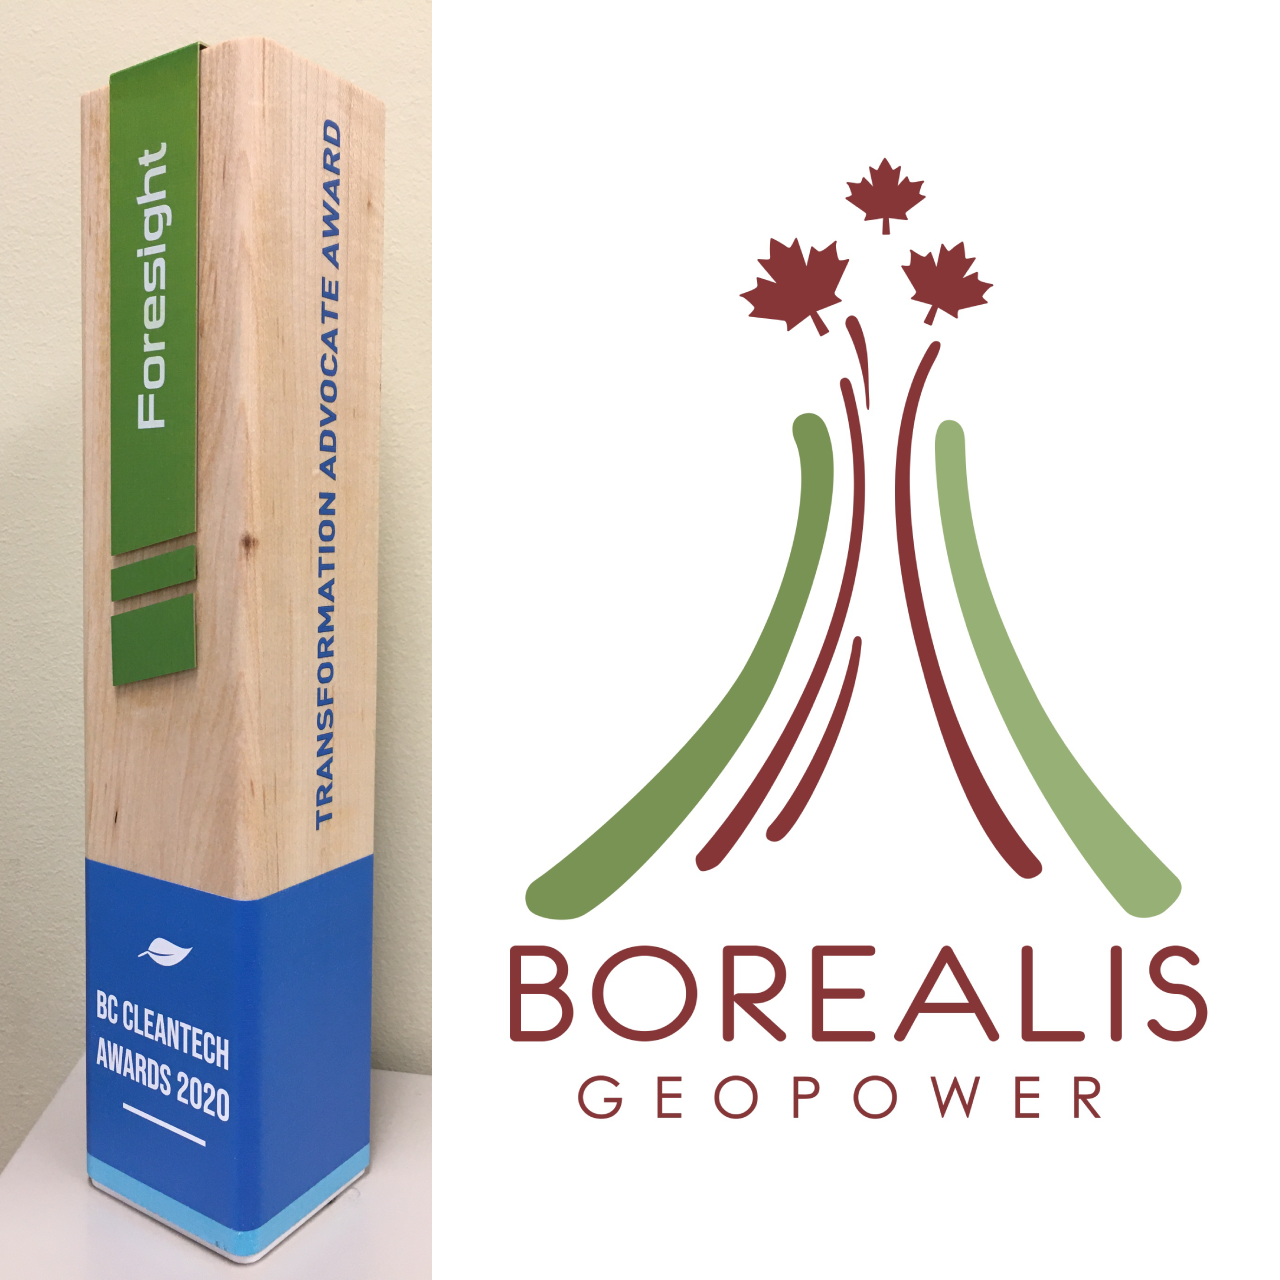 Borealis GeoPower Inc – BC CleanTech Awards 2020 Winners